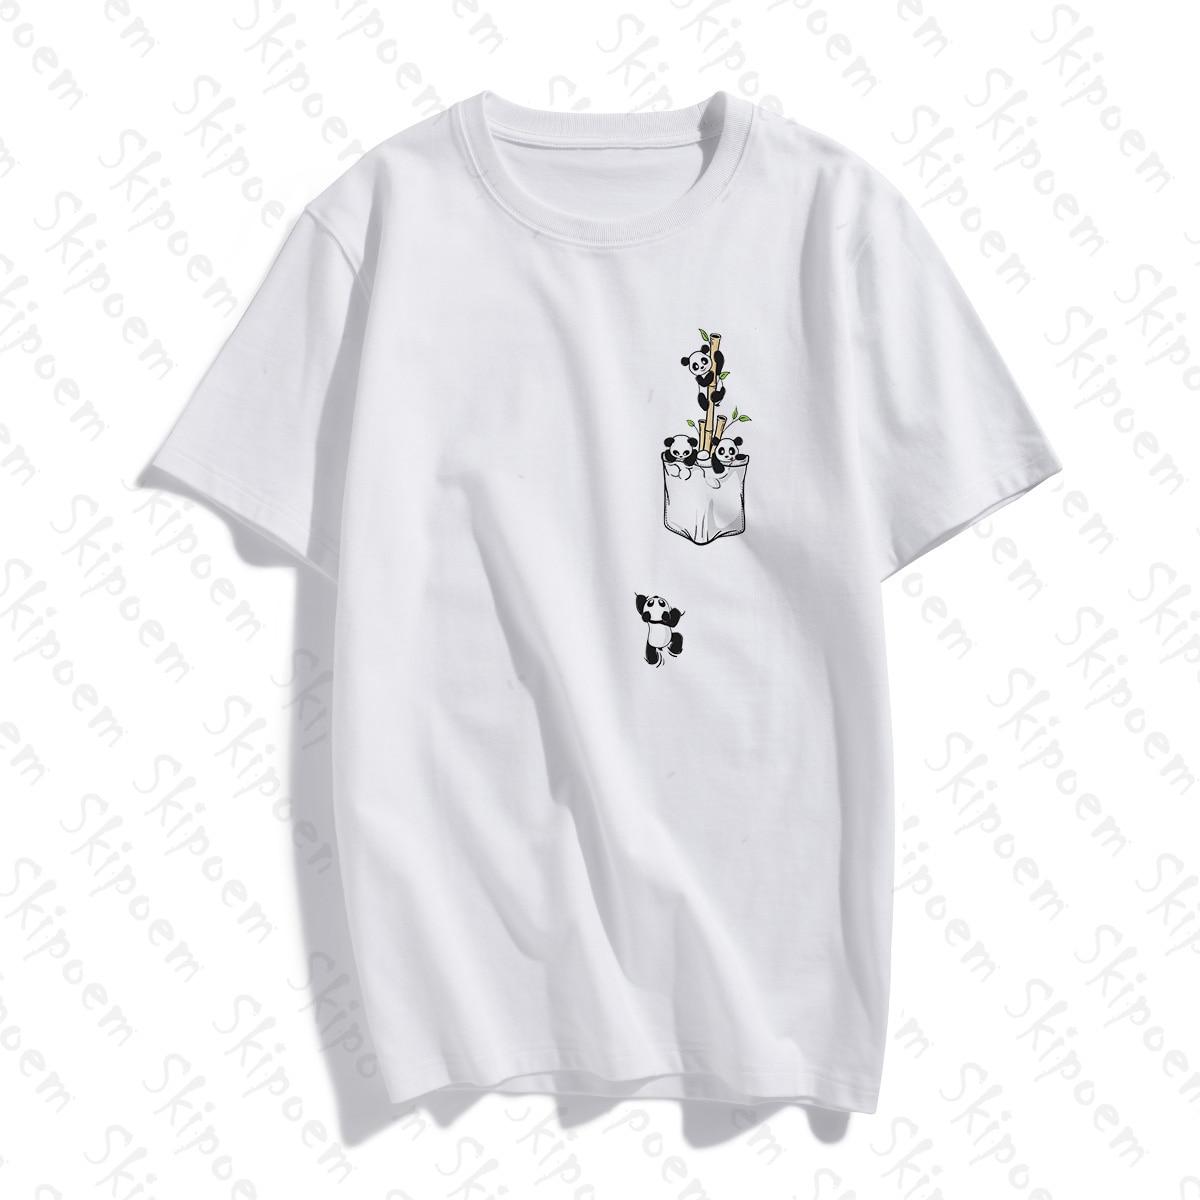 A Panda Dropped From His Pocket Women Tshirt Aesthetic Tumblr Harajuku Kawaii Short Sleeve Cotton Plus Size Top Tees Streetwear